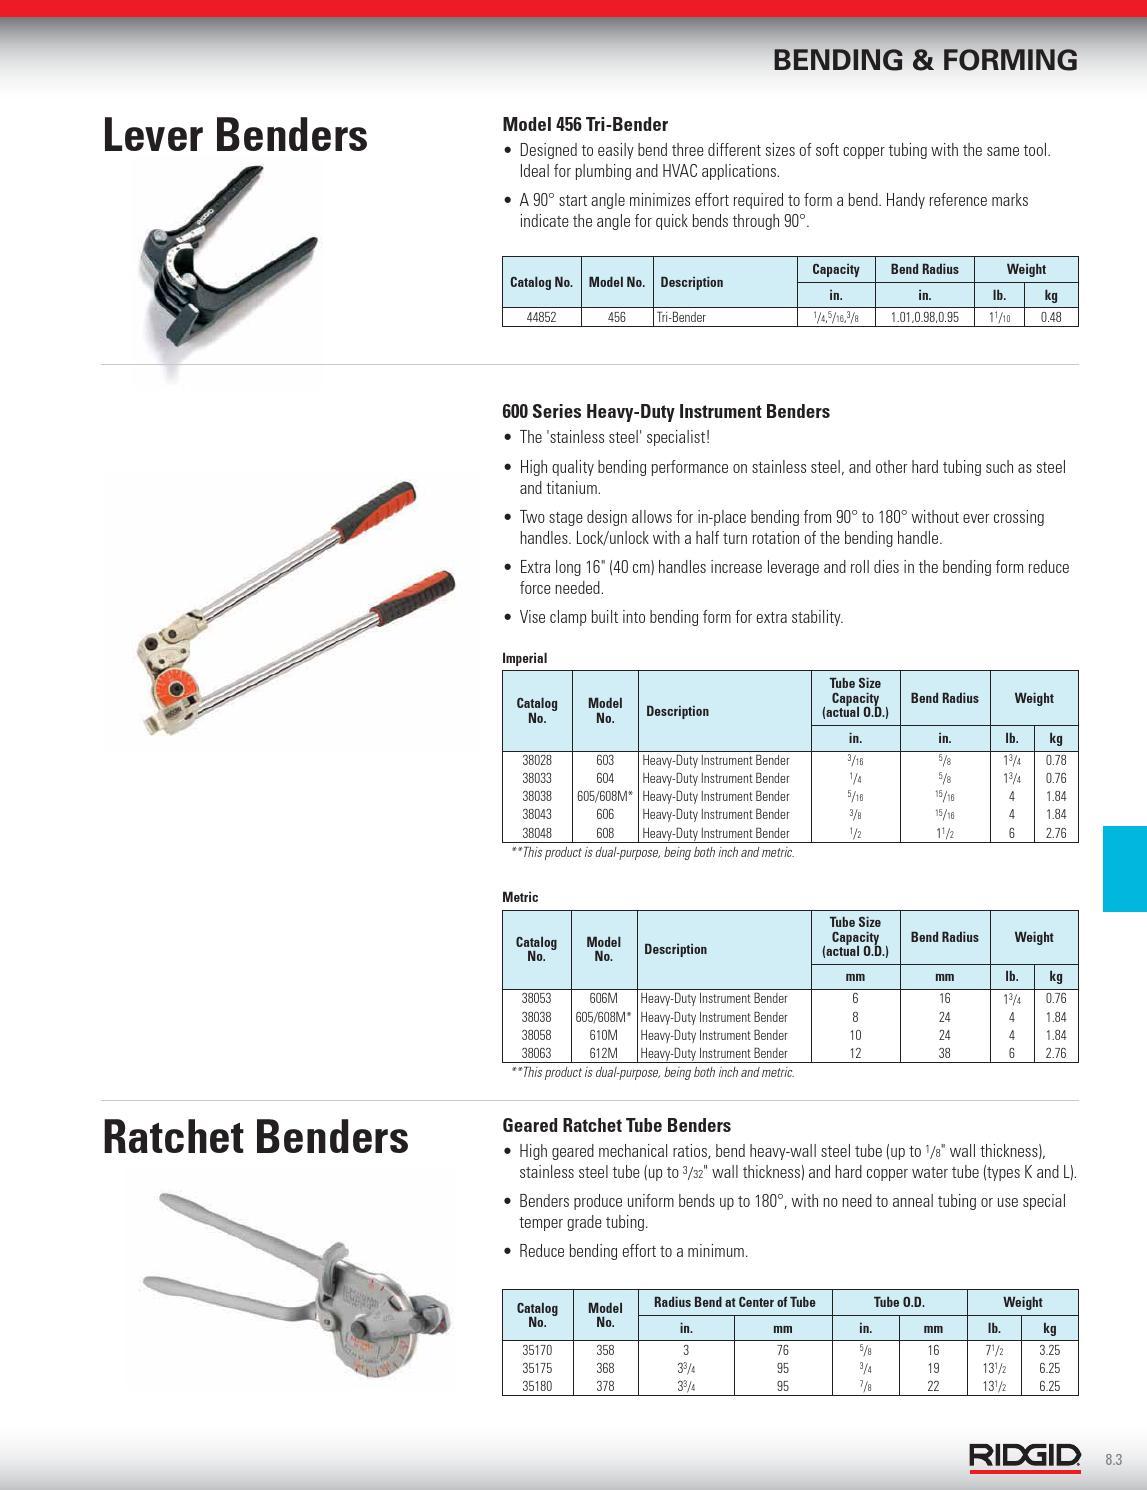 RIDGID 38048 Model 608 Heavy-Duty Pipe Bender 1//2-inch Tubing Bender